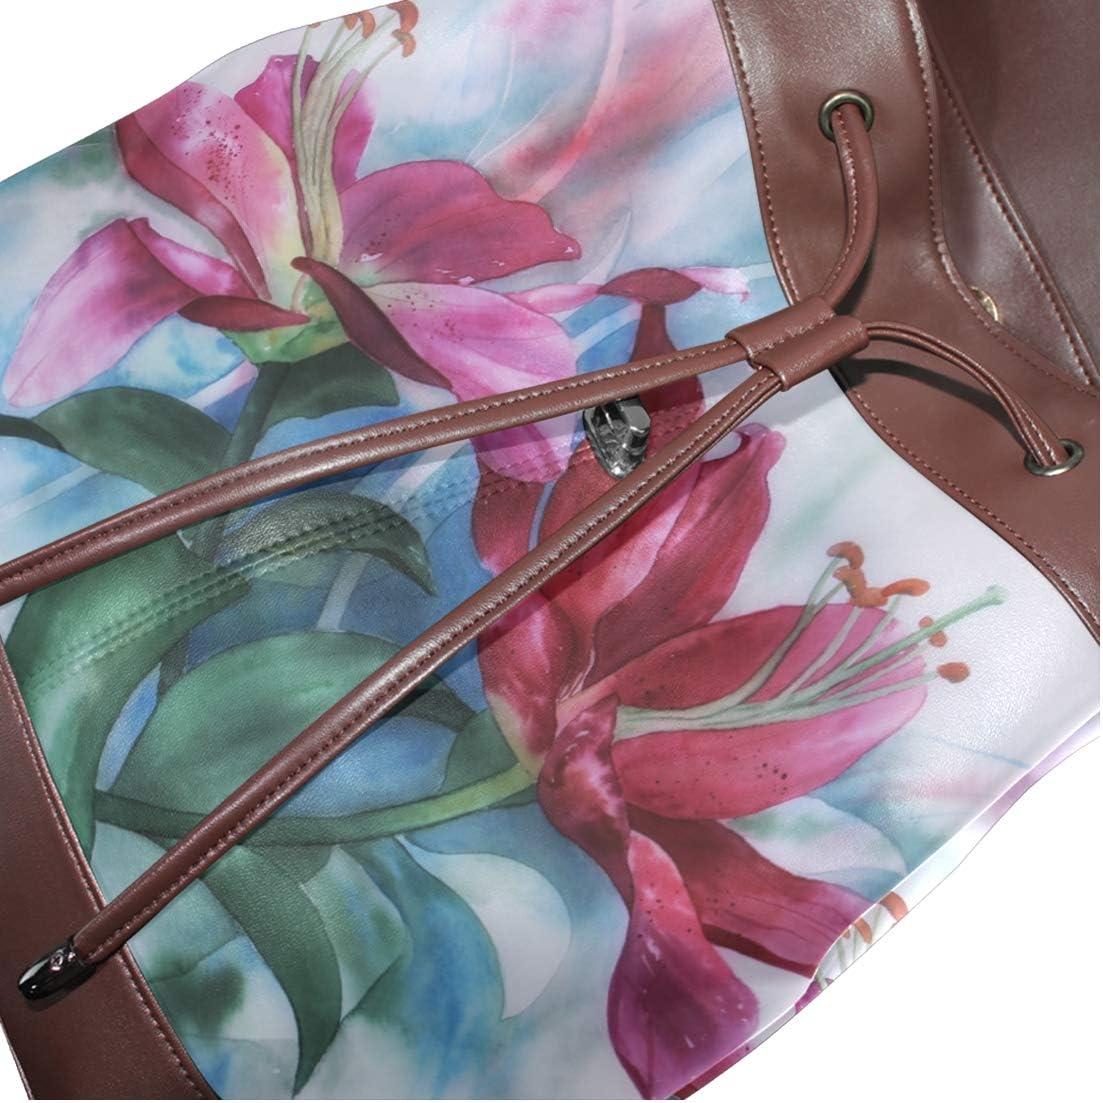 Shopping Bag Storage Bag For Men Women Girls Boys Personalized Pattern Watercolor Painting Backpack School Bag Travel Bag